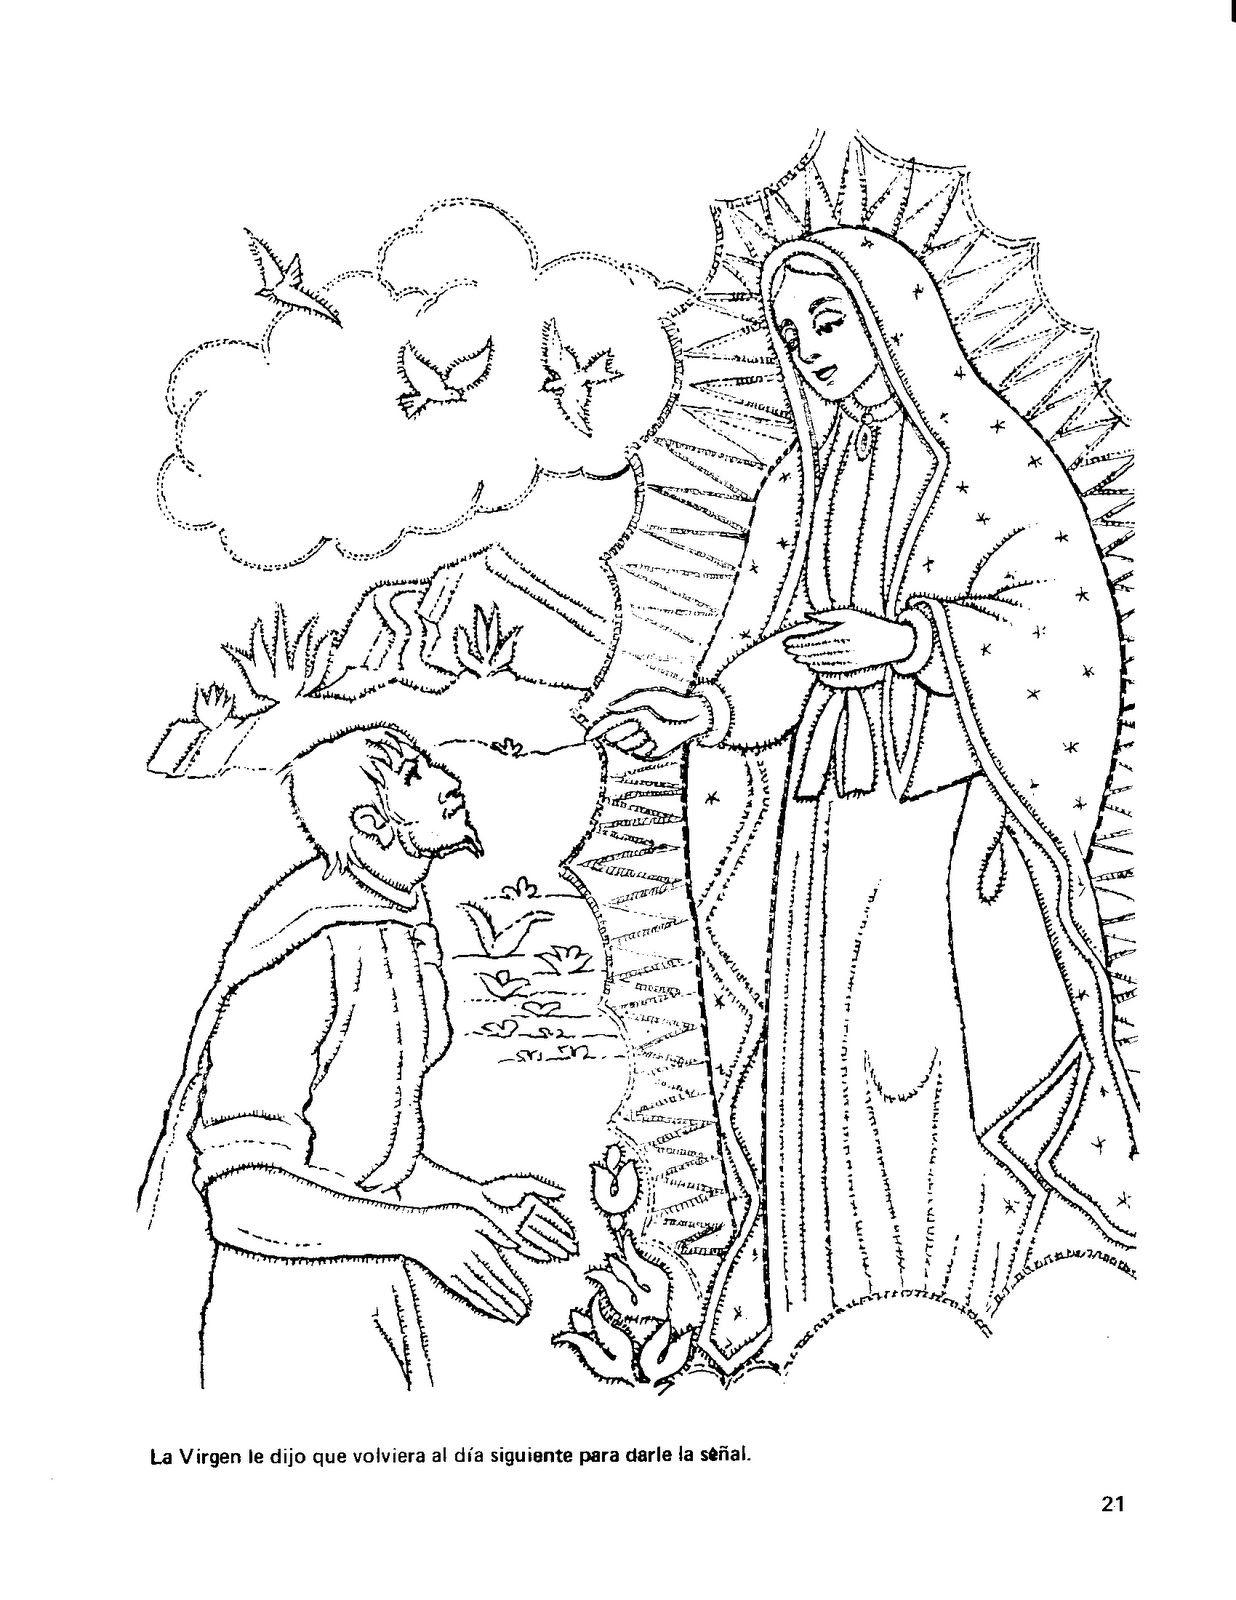 Printable to color of la virgen de guadalupe | Teaching - CICCA ...